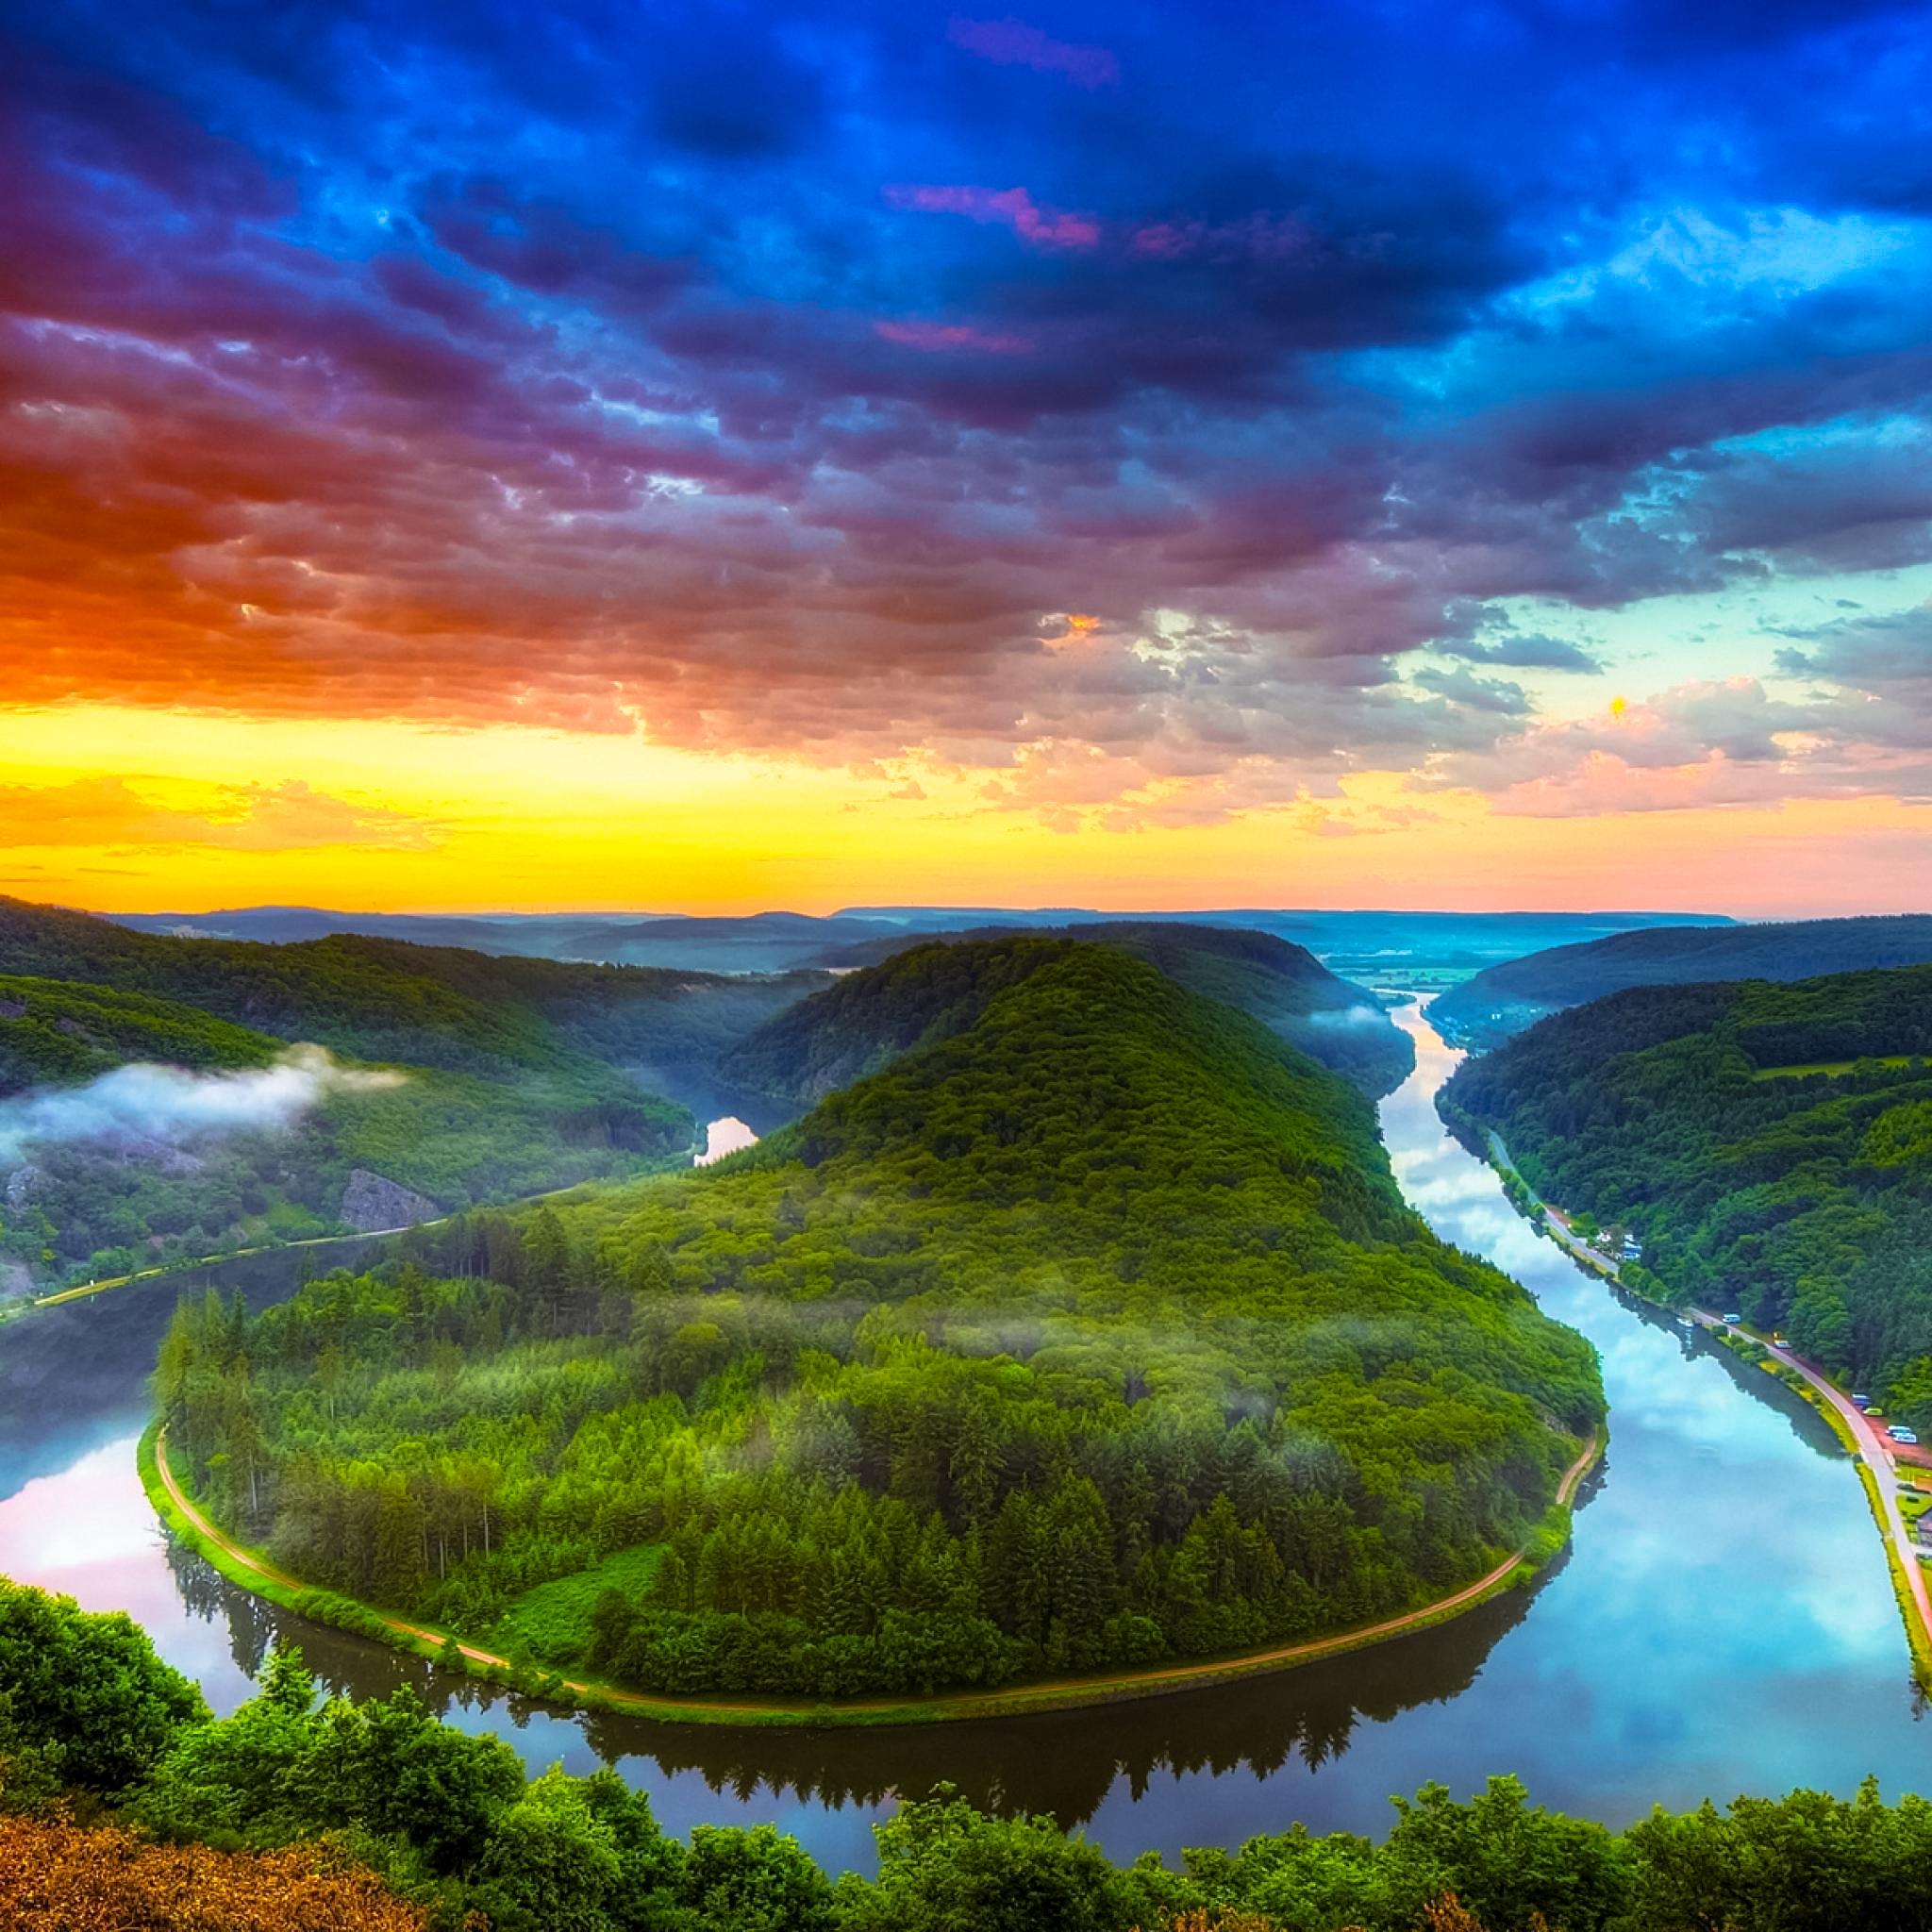 ★ Majestic River Bend by @RetinaiPadWalls on twitter.jpg